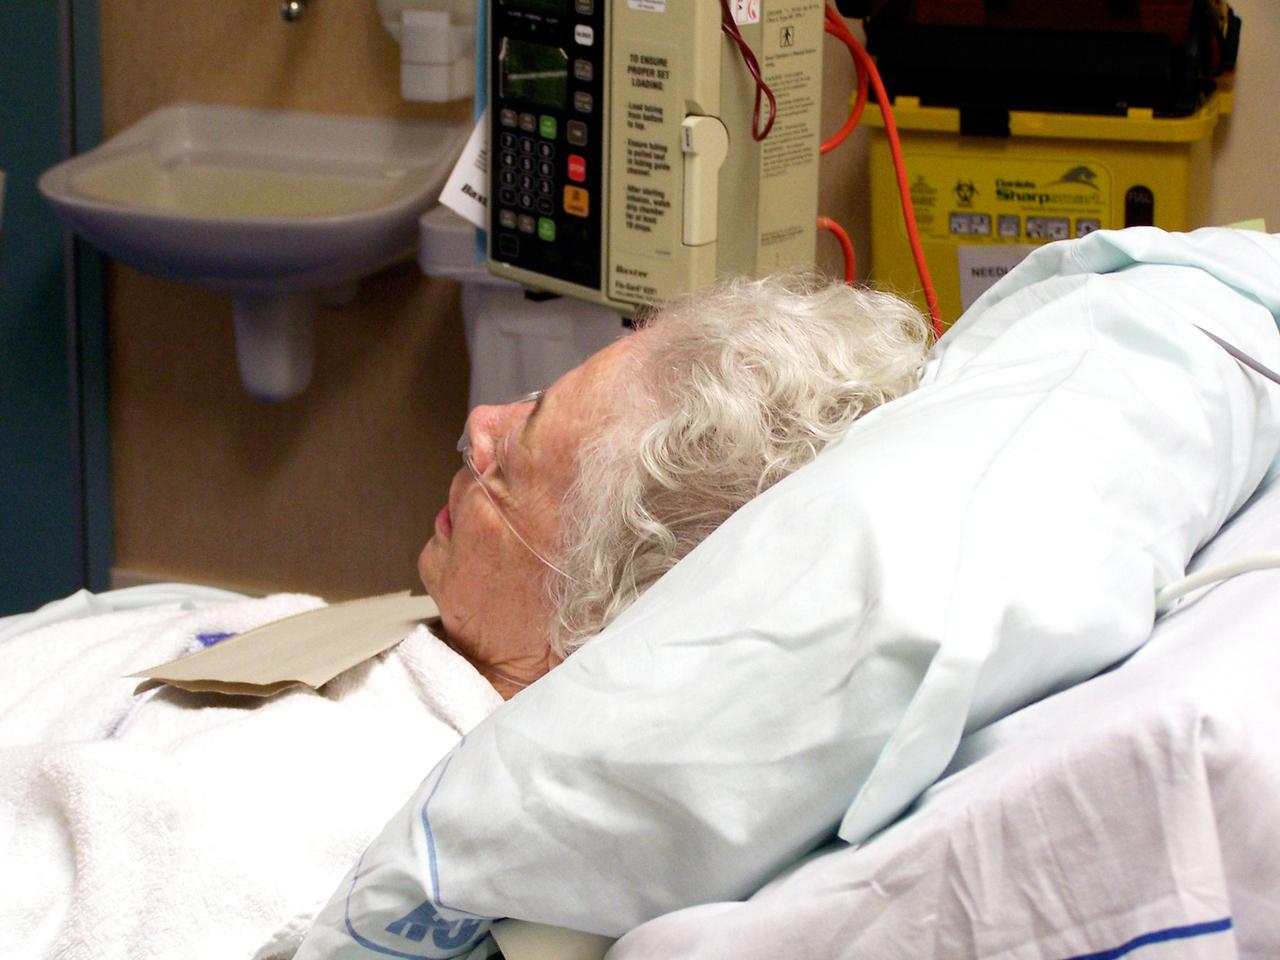 elderly-hospital-patient-1437289-1280x960.jpg